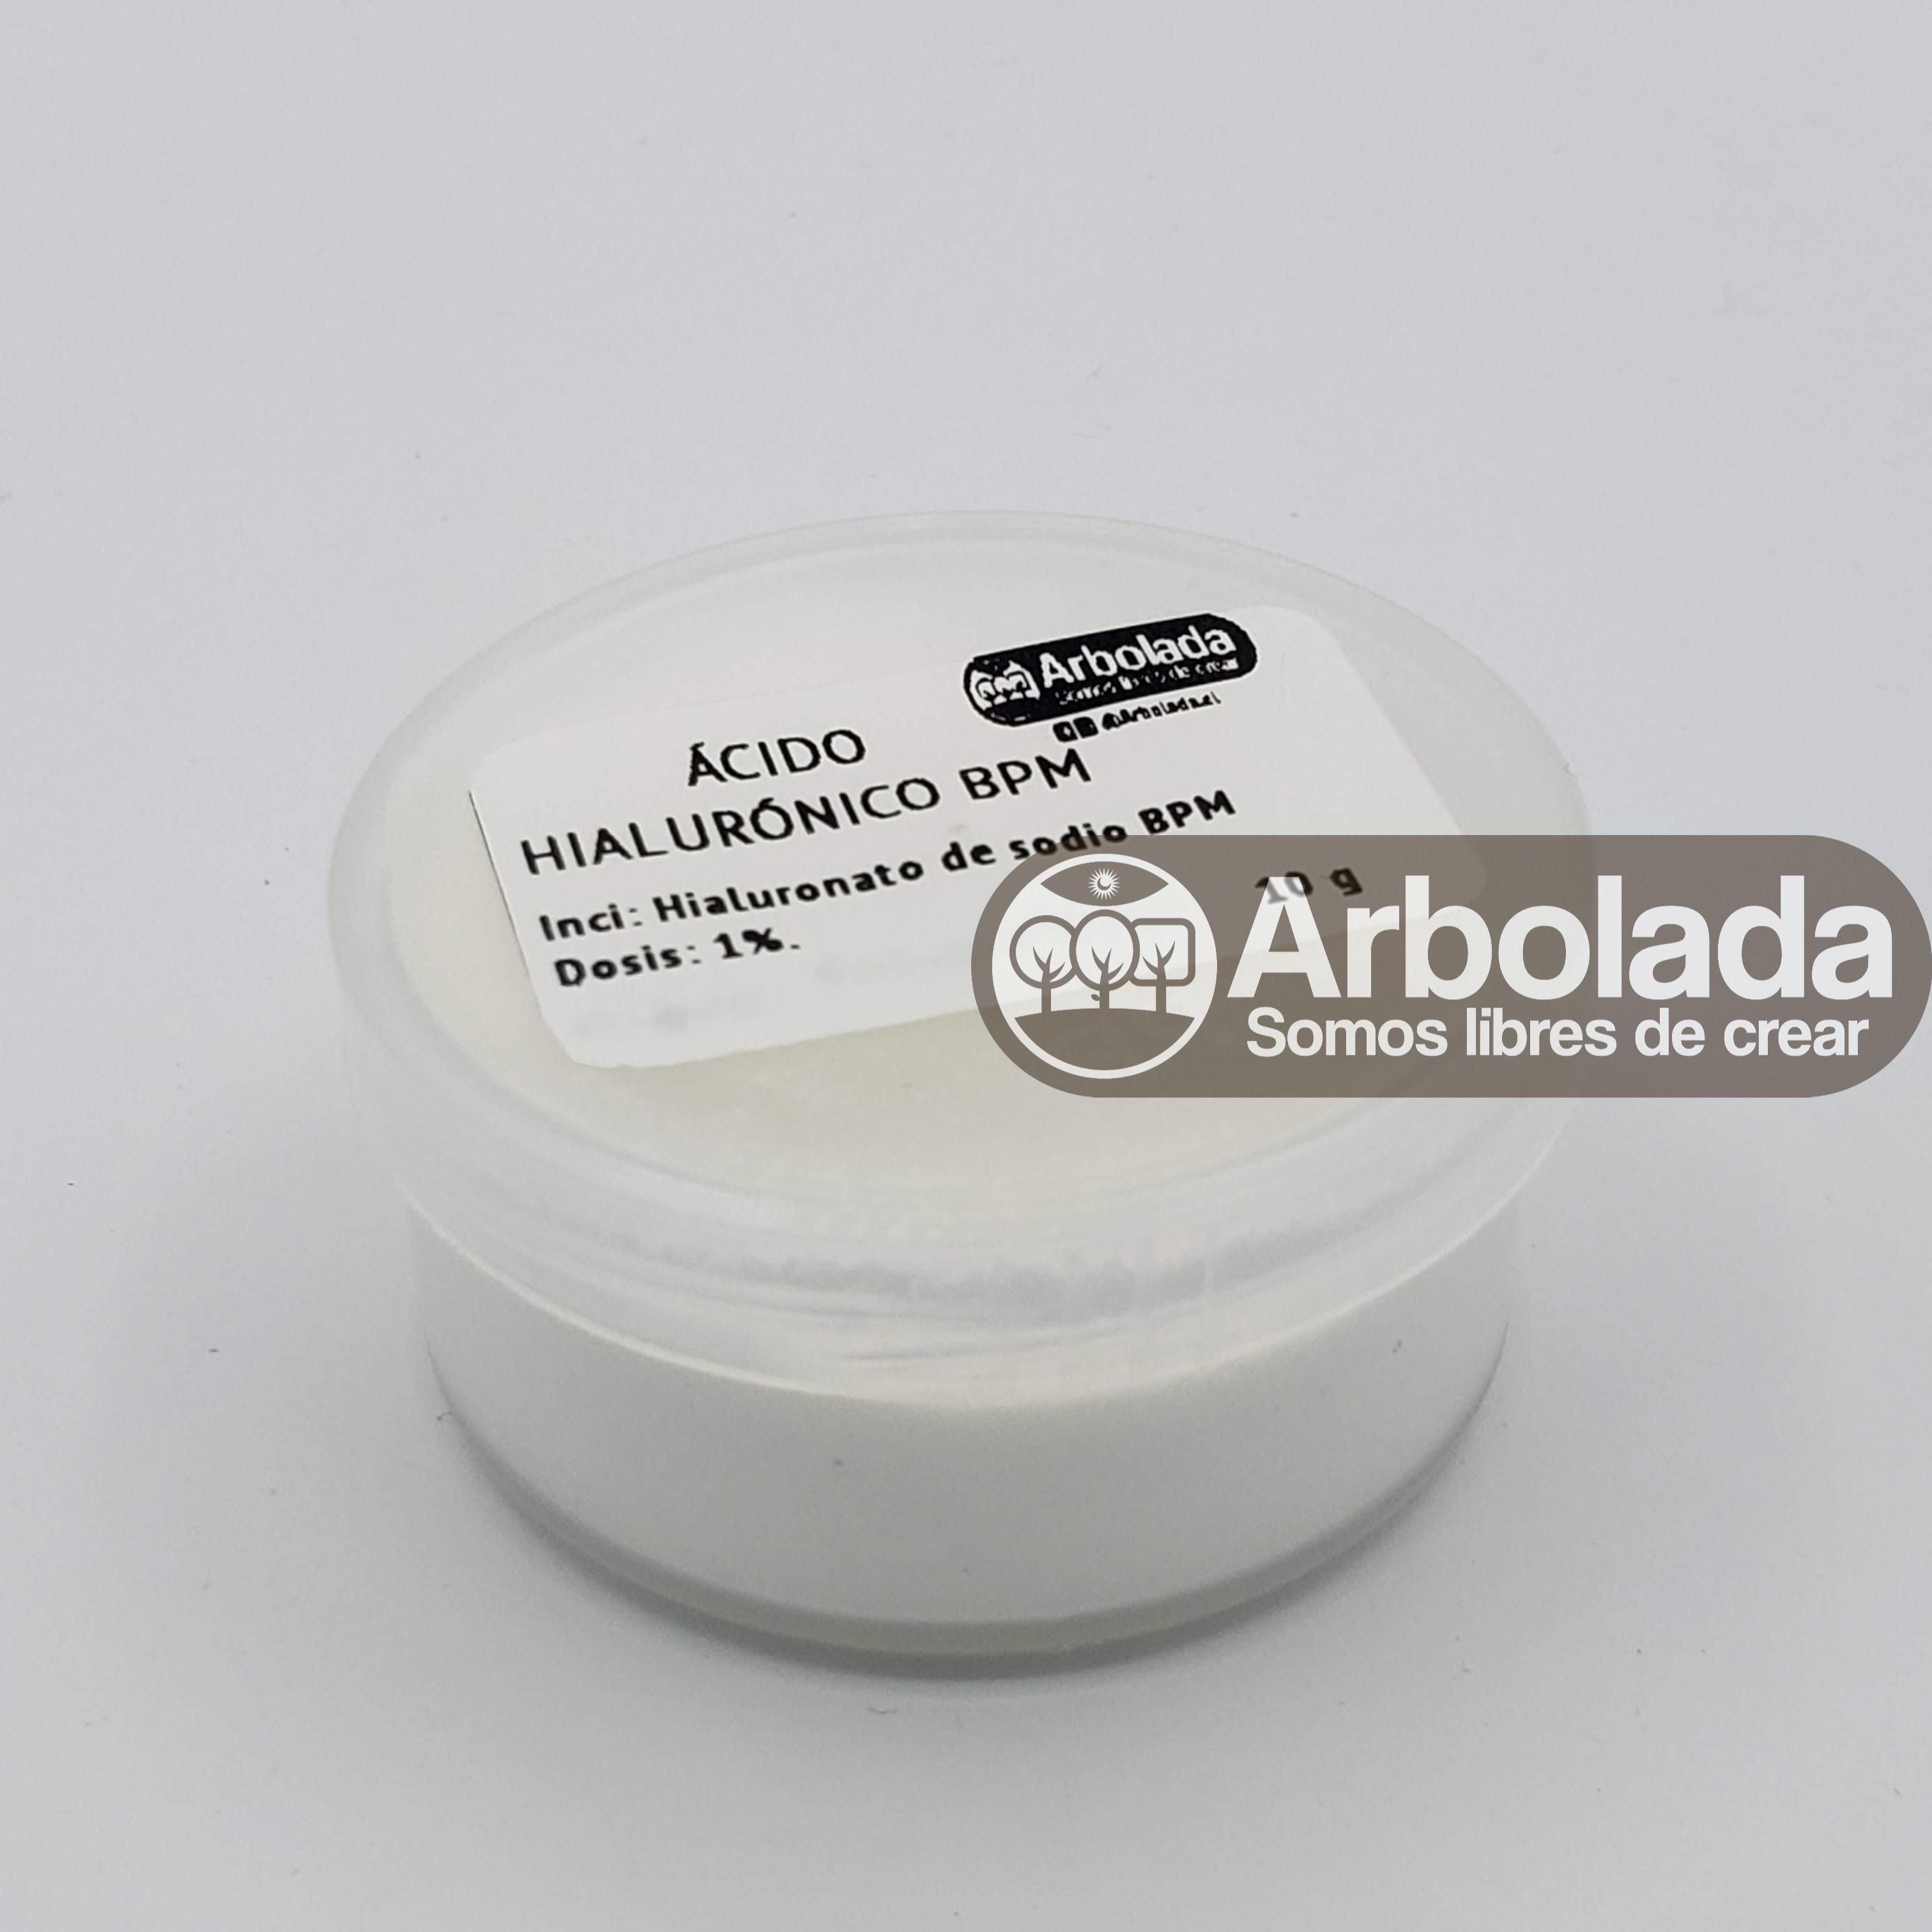 Ácido Hialurónico BPM en Polvo